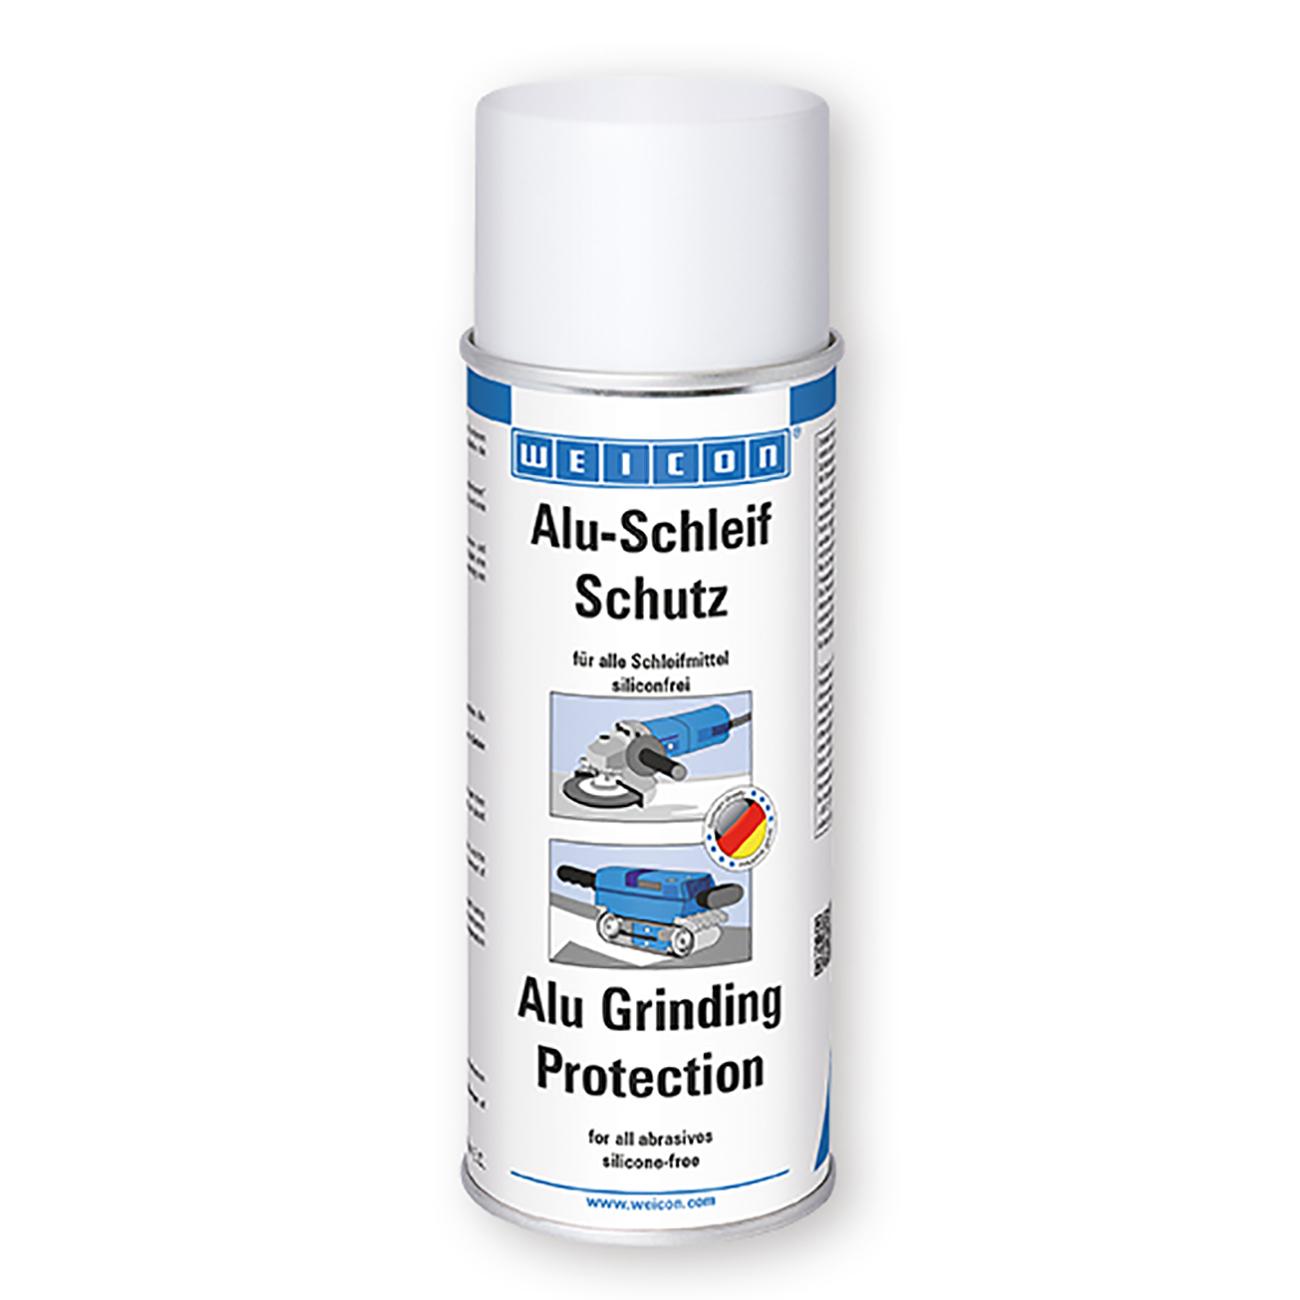 Фото Шлиф-защита Weicon Alu-Grinding Protection для алюминия (400 мл) {wcn11451400}